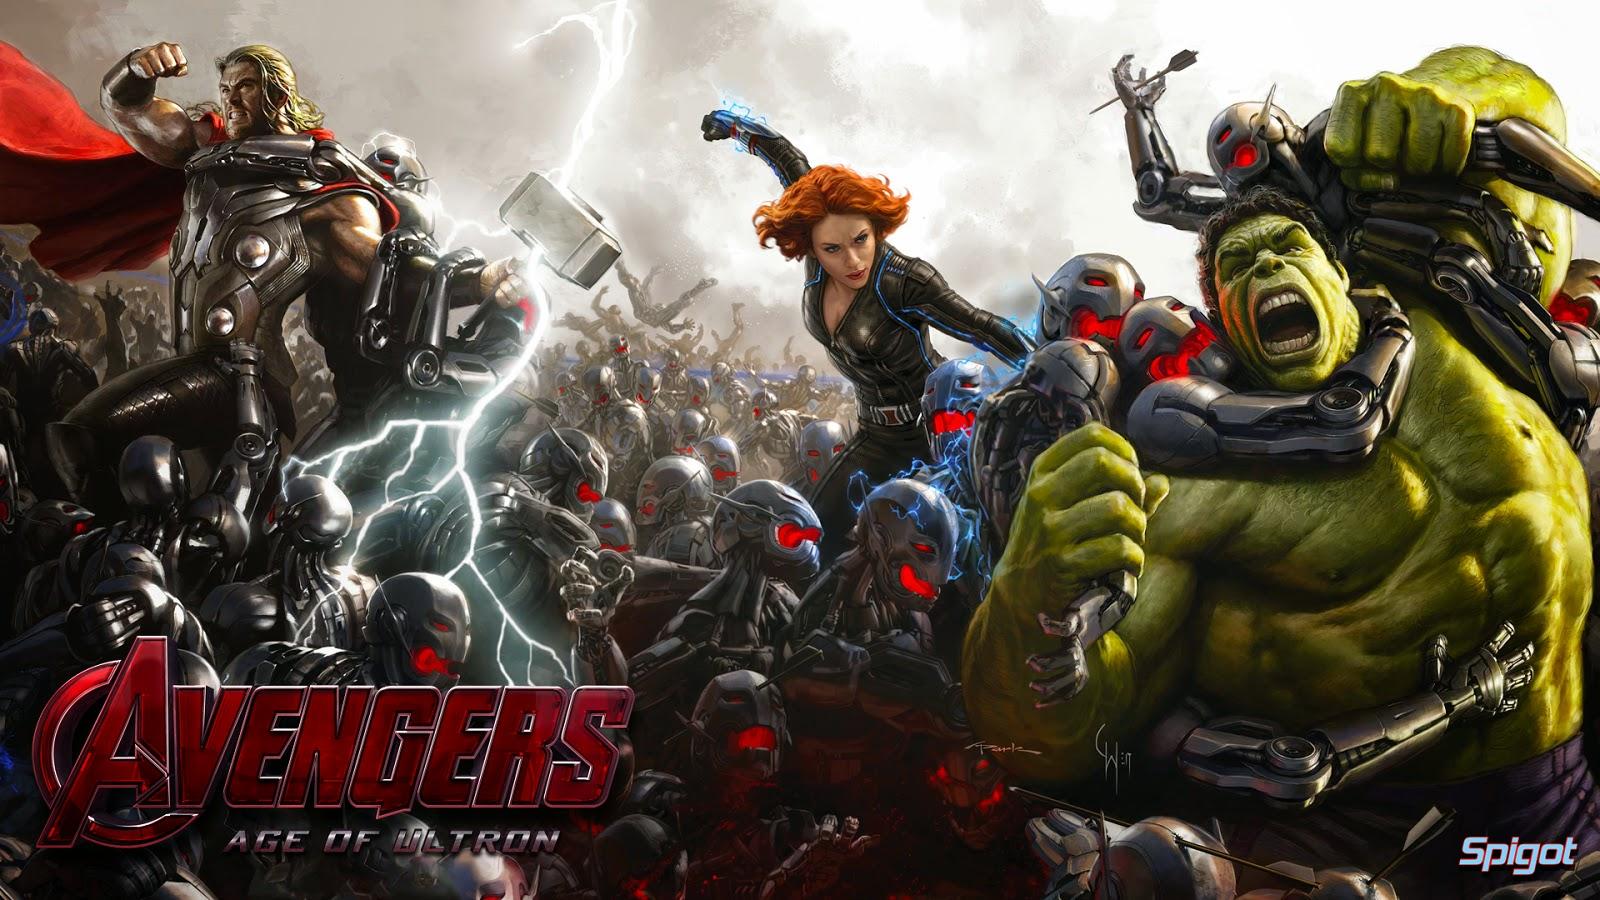 avengers age of ultron 720p hdrip